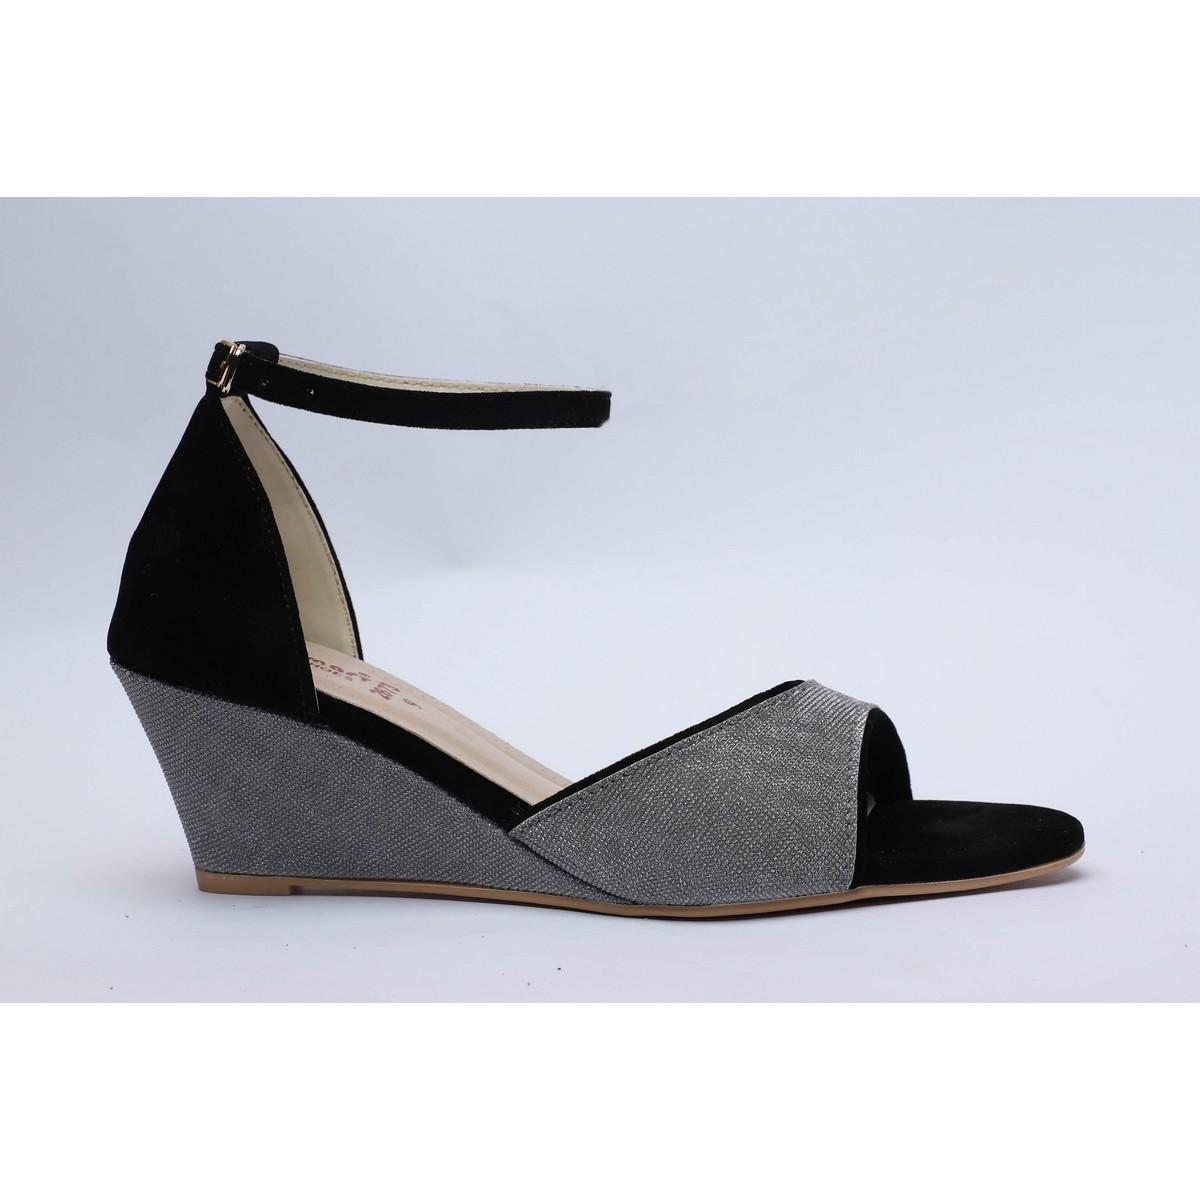 Silver Black Bling Wedge Platform Sandal High Heels Summer,  Fashion, Casual, Weeding, Party, Black, Silver